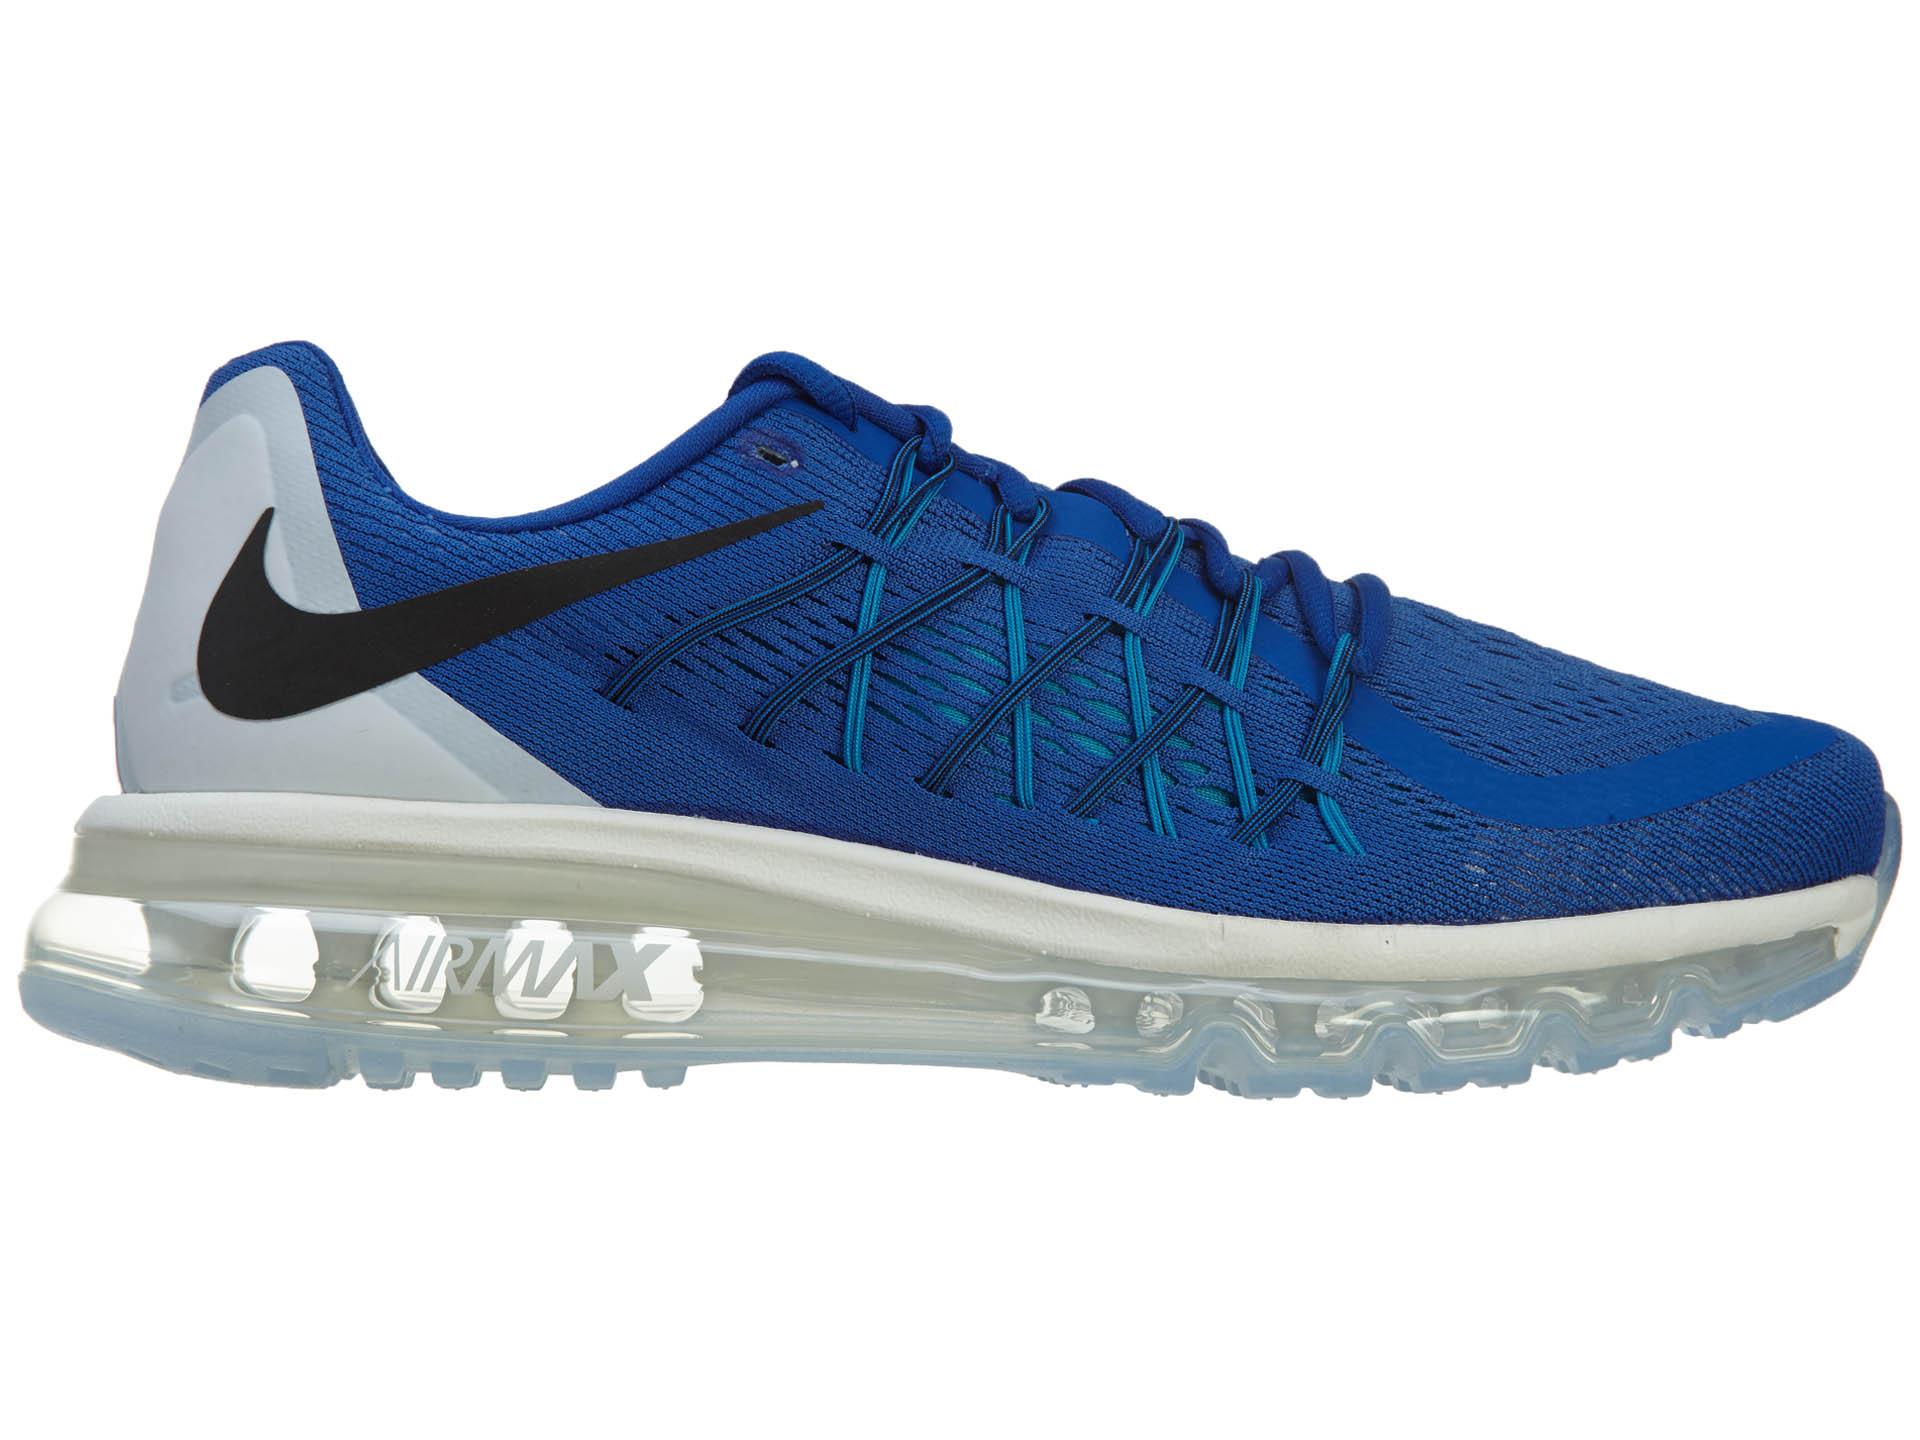 Nike Air Max 2015 Game Royal/Black-White-Blue Lgn